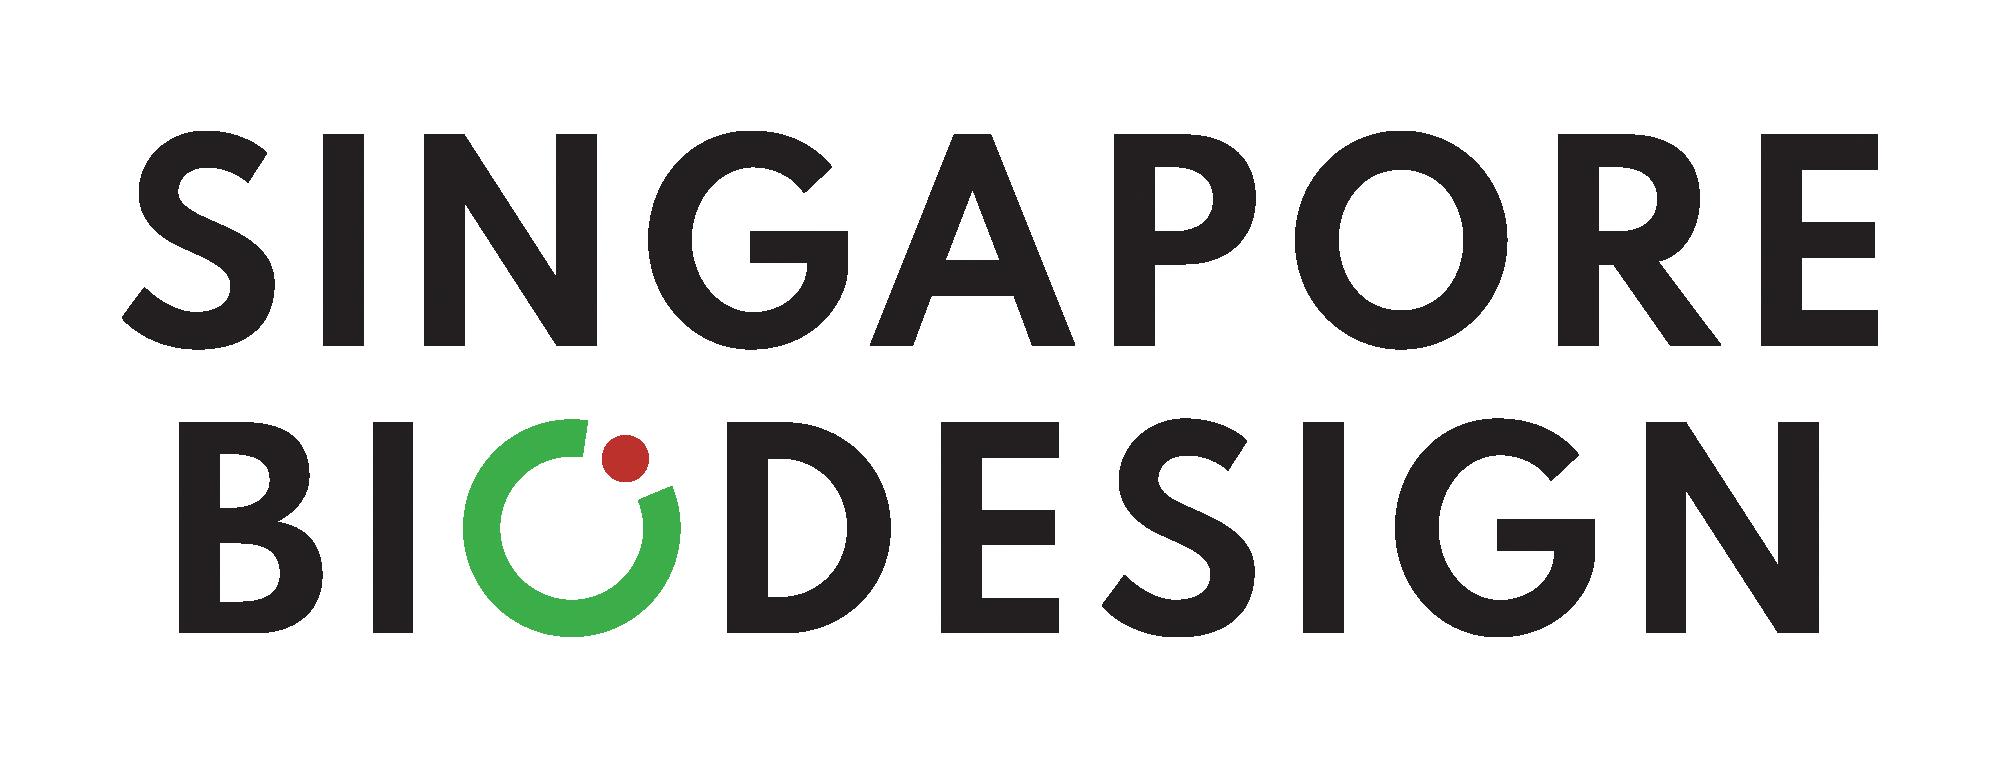 Singapore Biodesign : Brand Short Description Type Here.